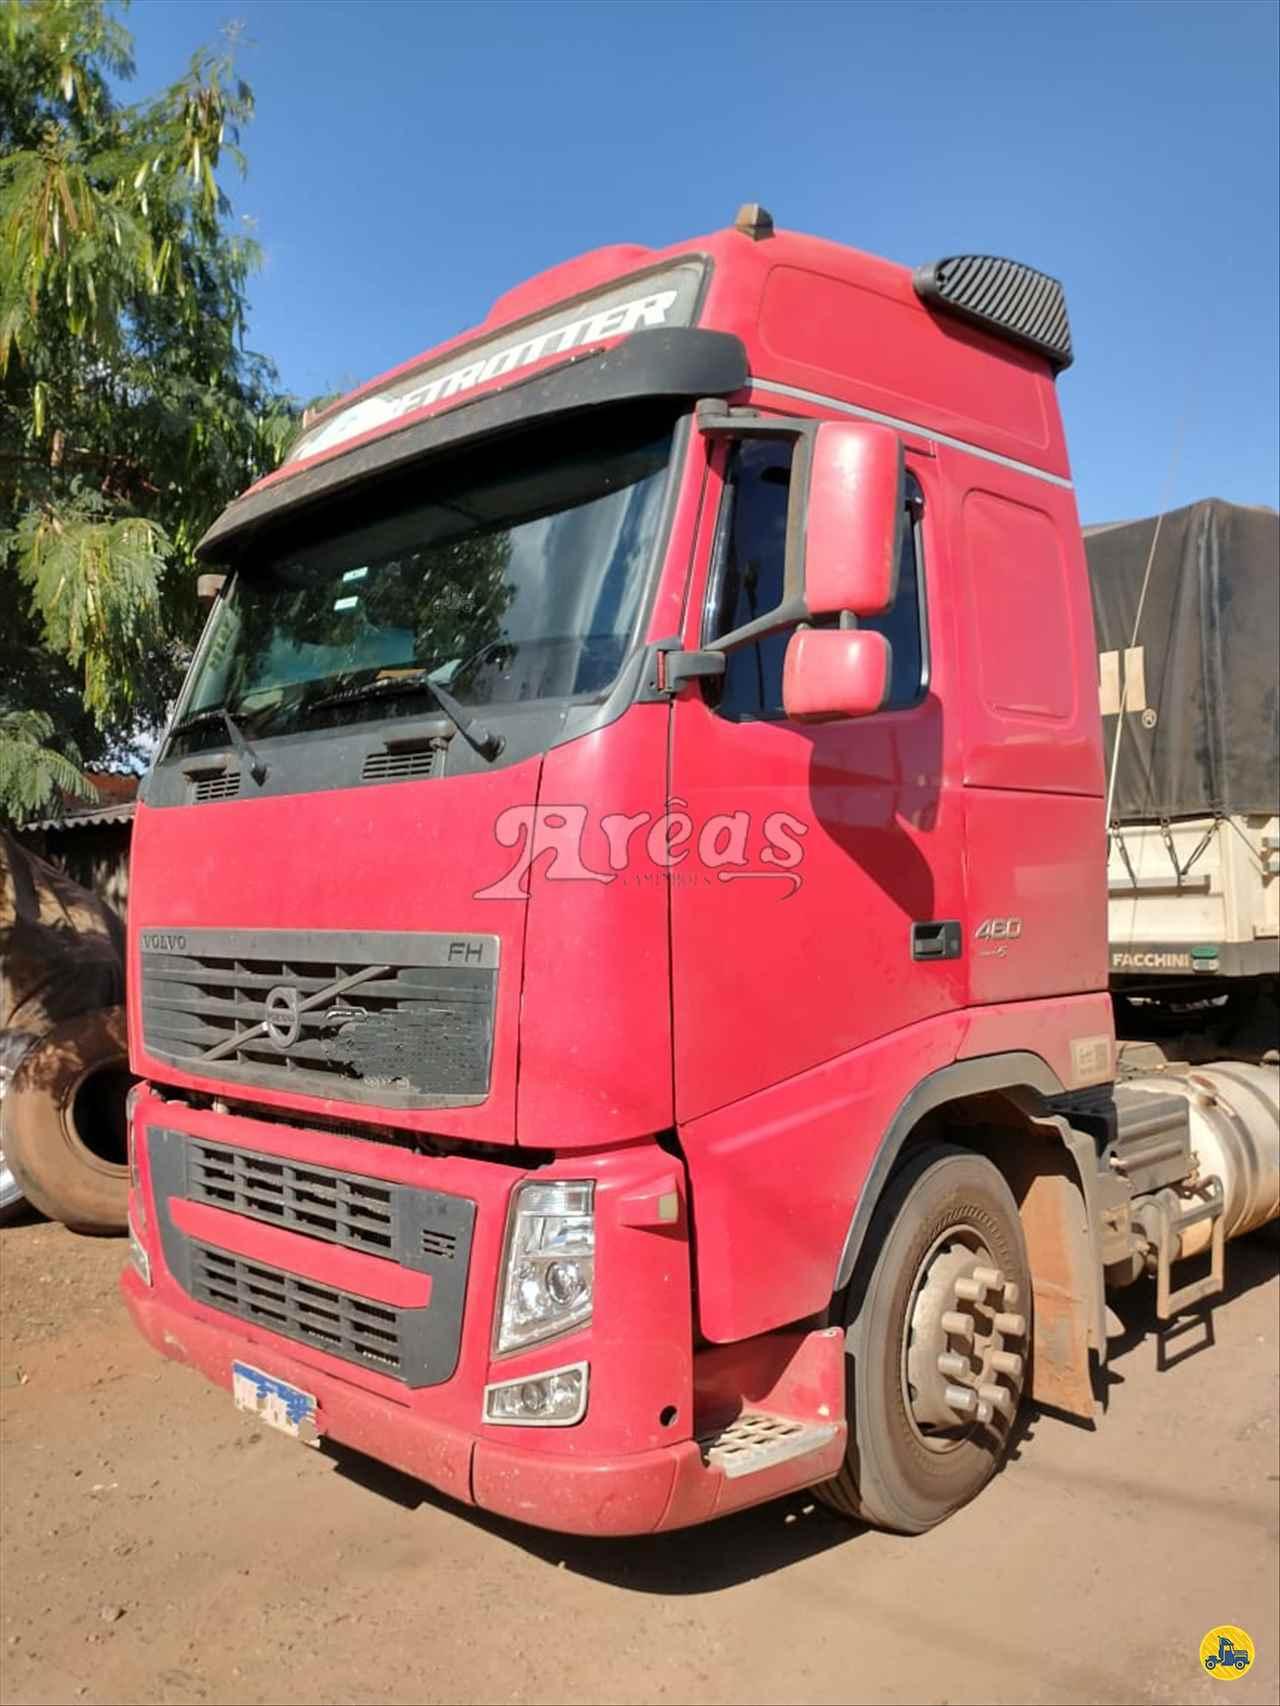 CAMINHAO VOLVO VOLVO FH 460 Cavalo Mecânico Truck 6x2 Arêas Caminhões MARINGA PARANÁ PR